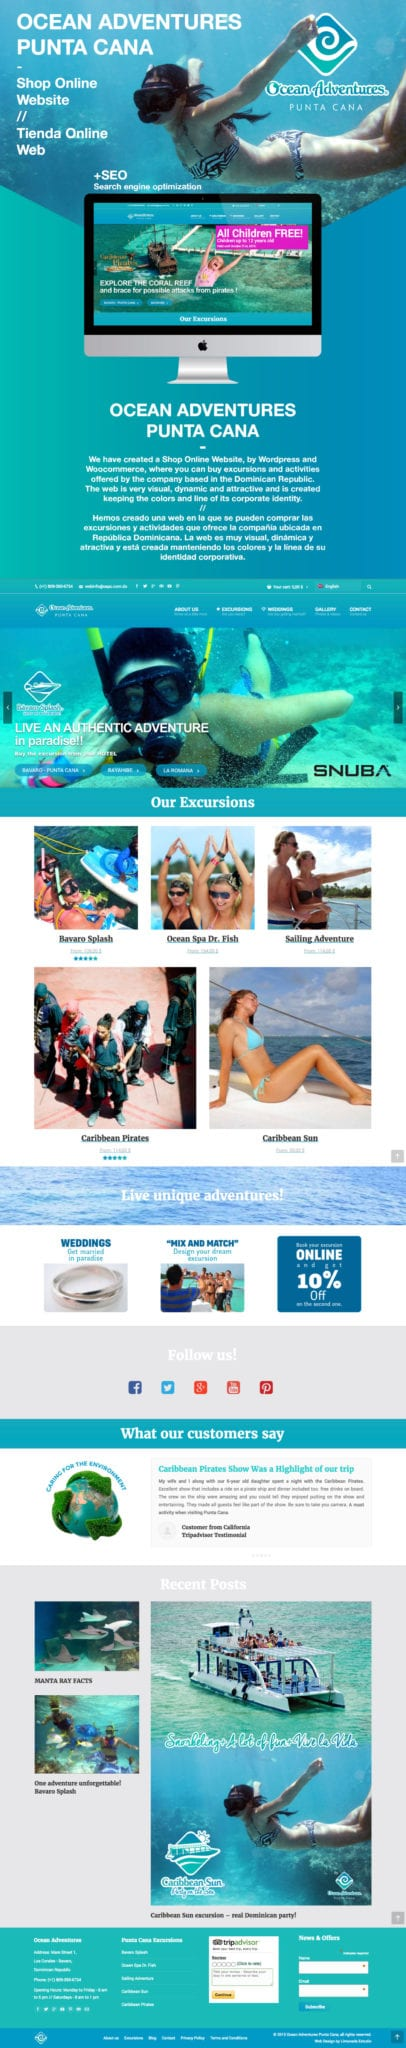 behance-web-tienda-online-ocean-adventures-punta-cana